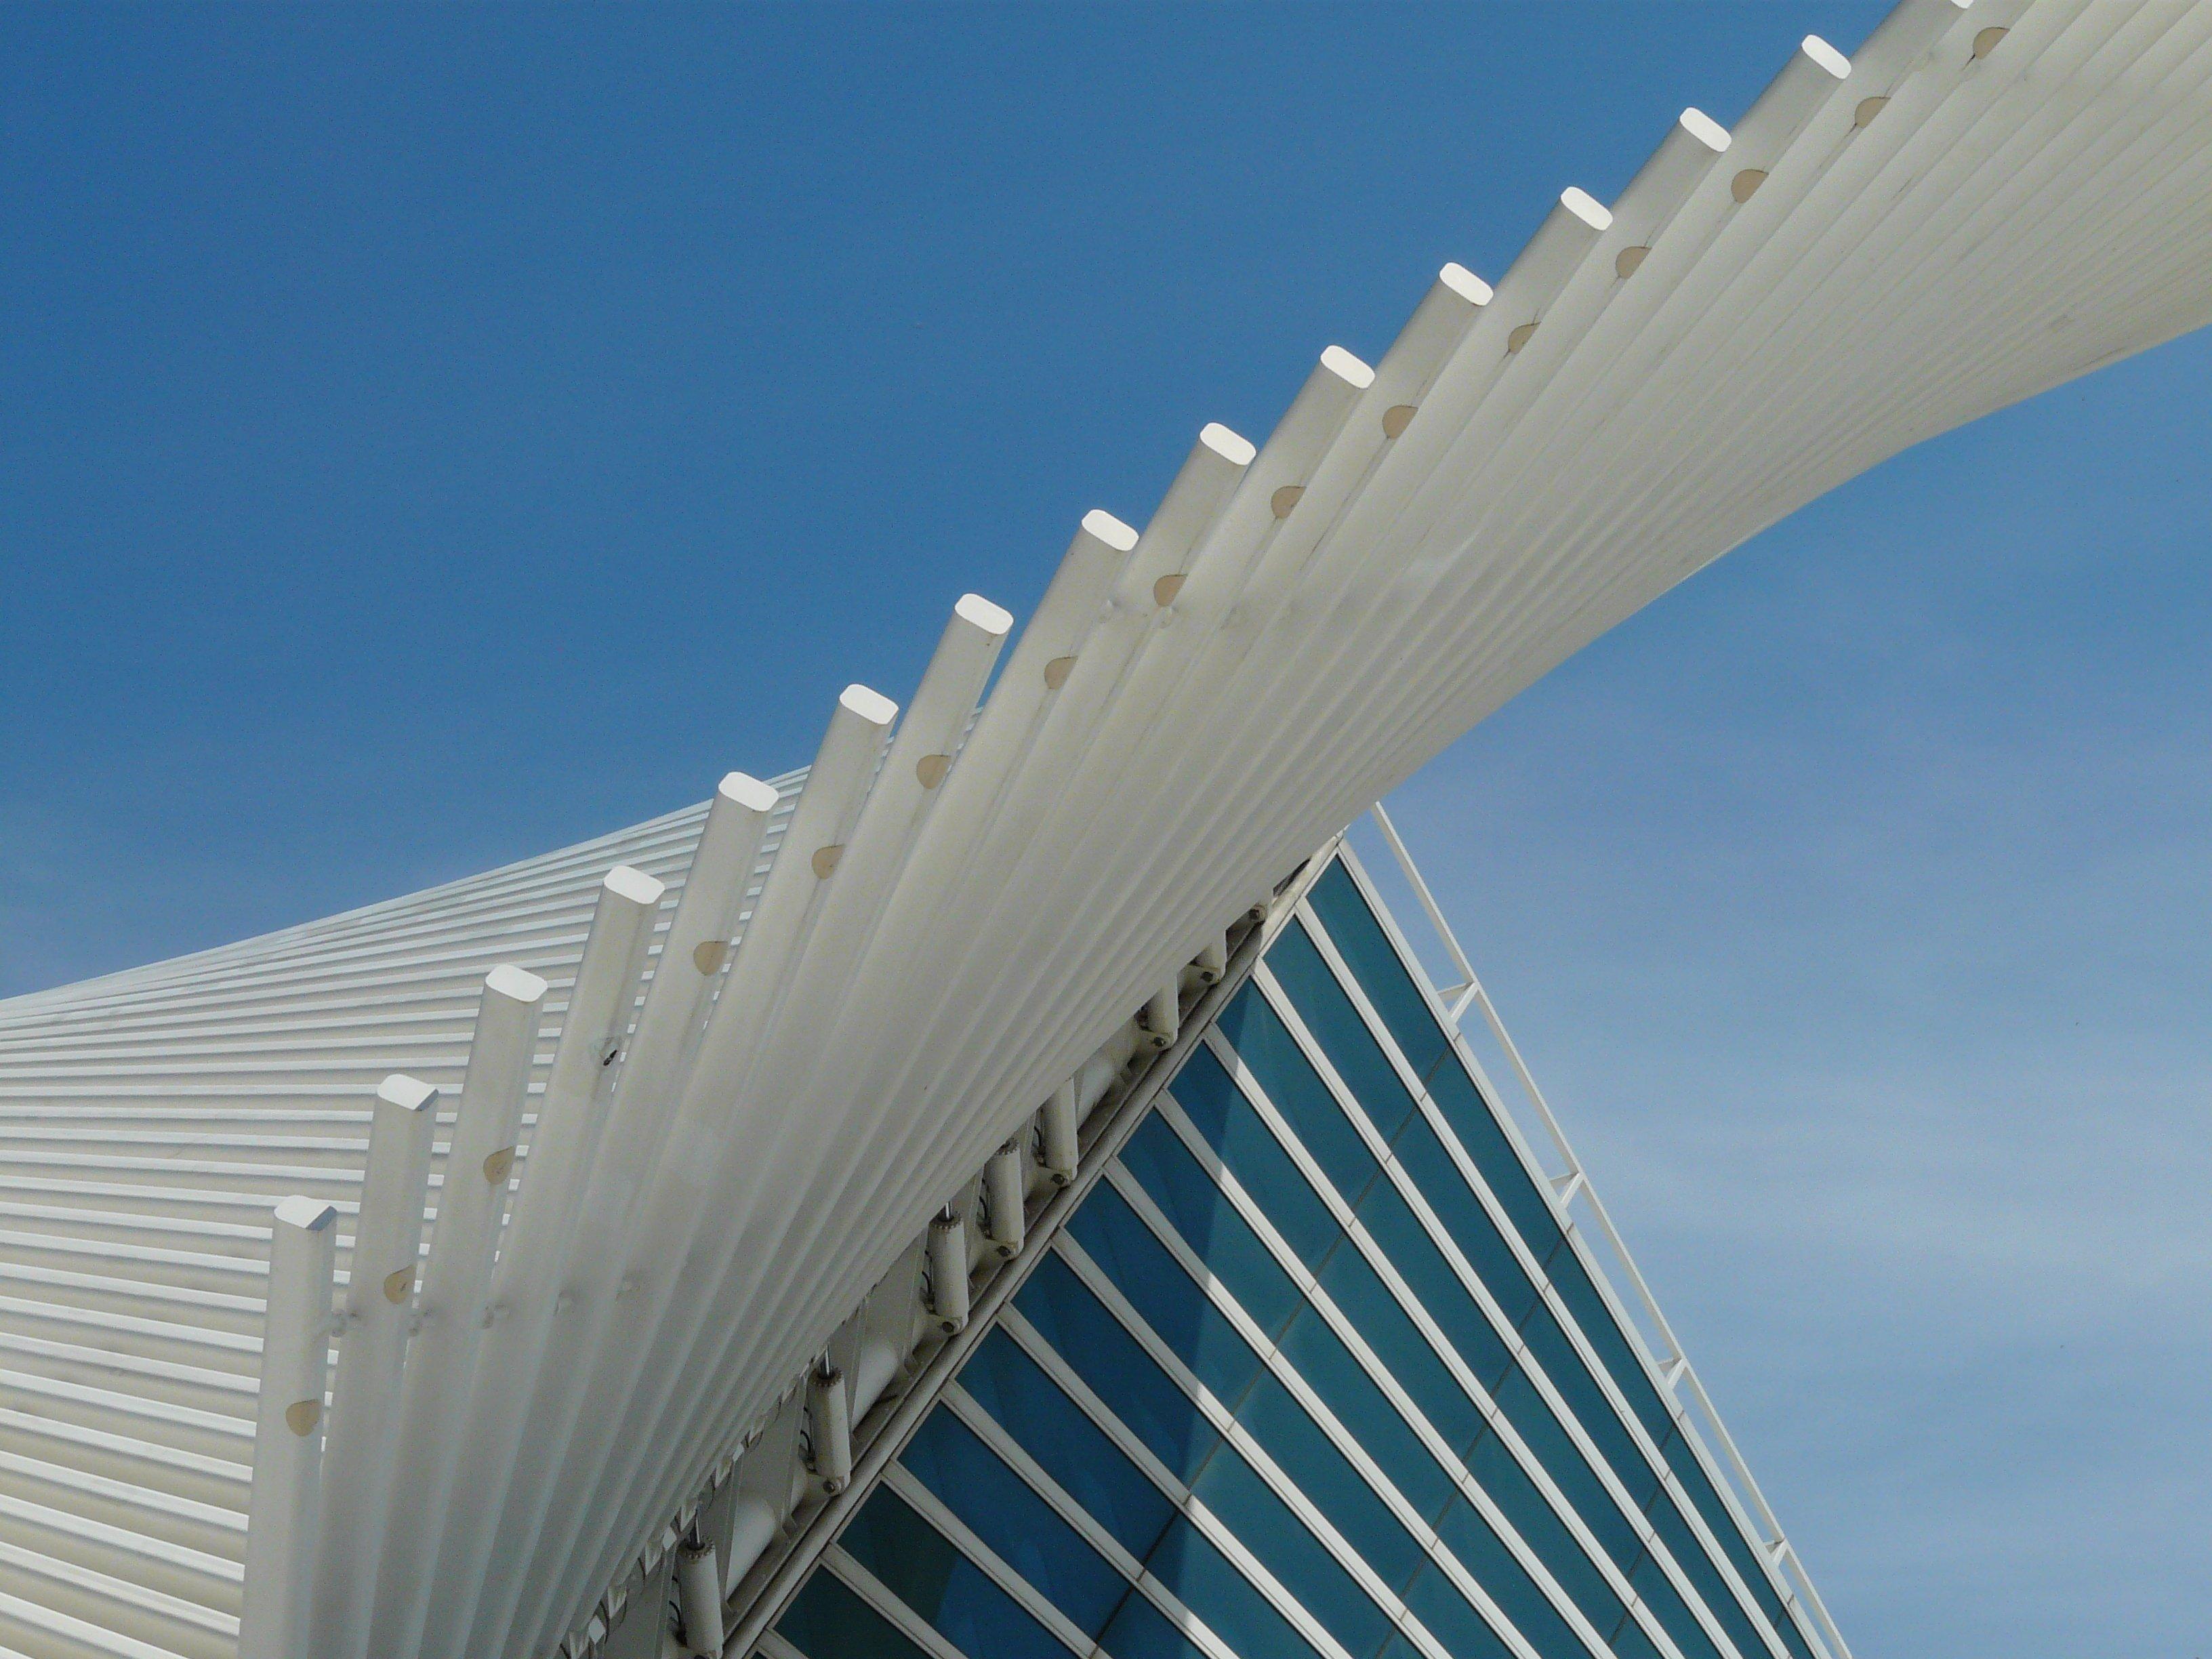 fotos gratis estructura vaso techo edificio rascacielos lnea museo punto de referencia fachada moderno bloque de pisos